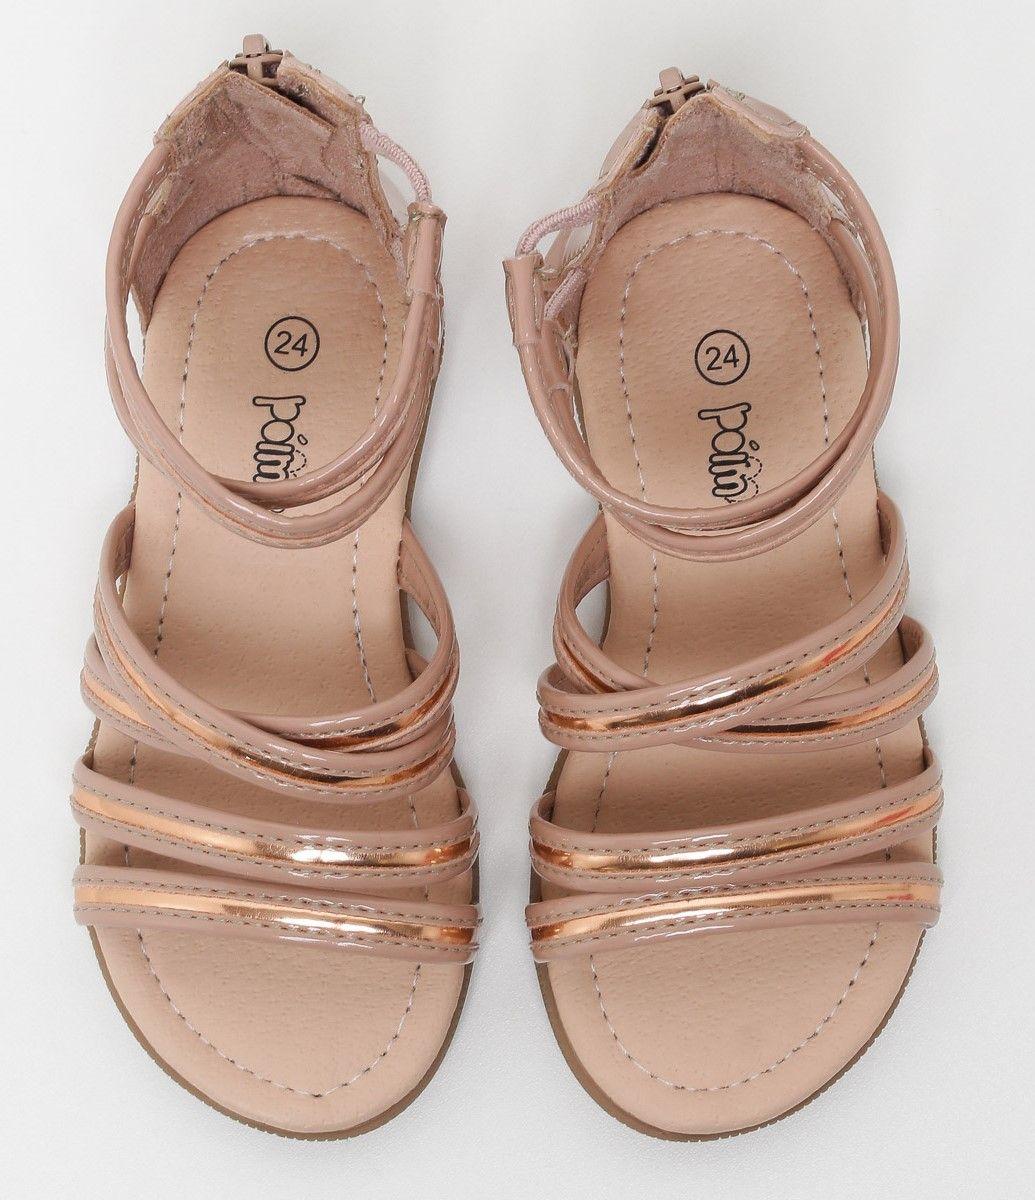 Chaussures Violettes Enfants Veja jhuusZvo